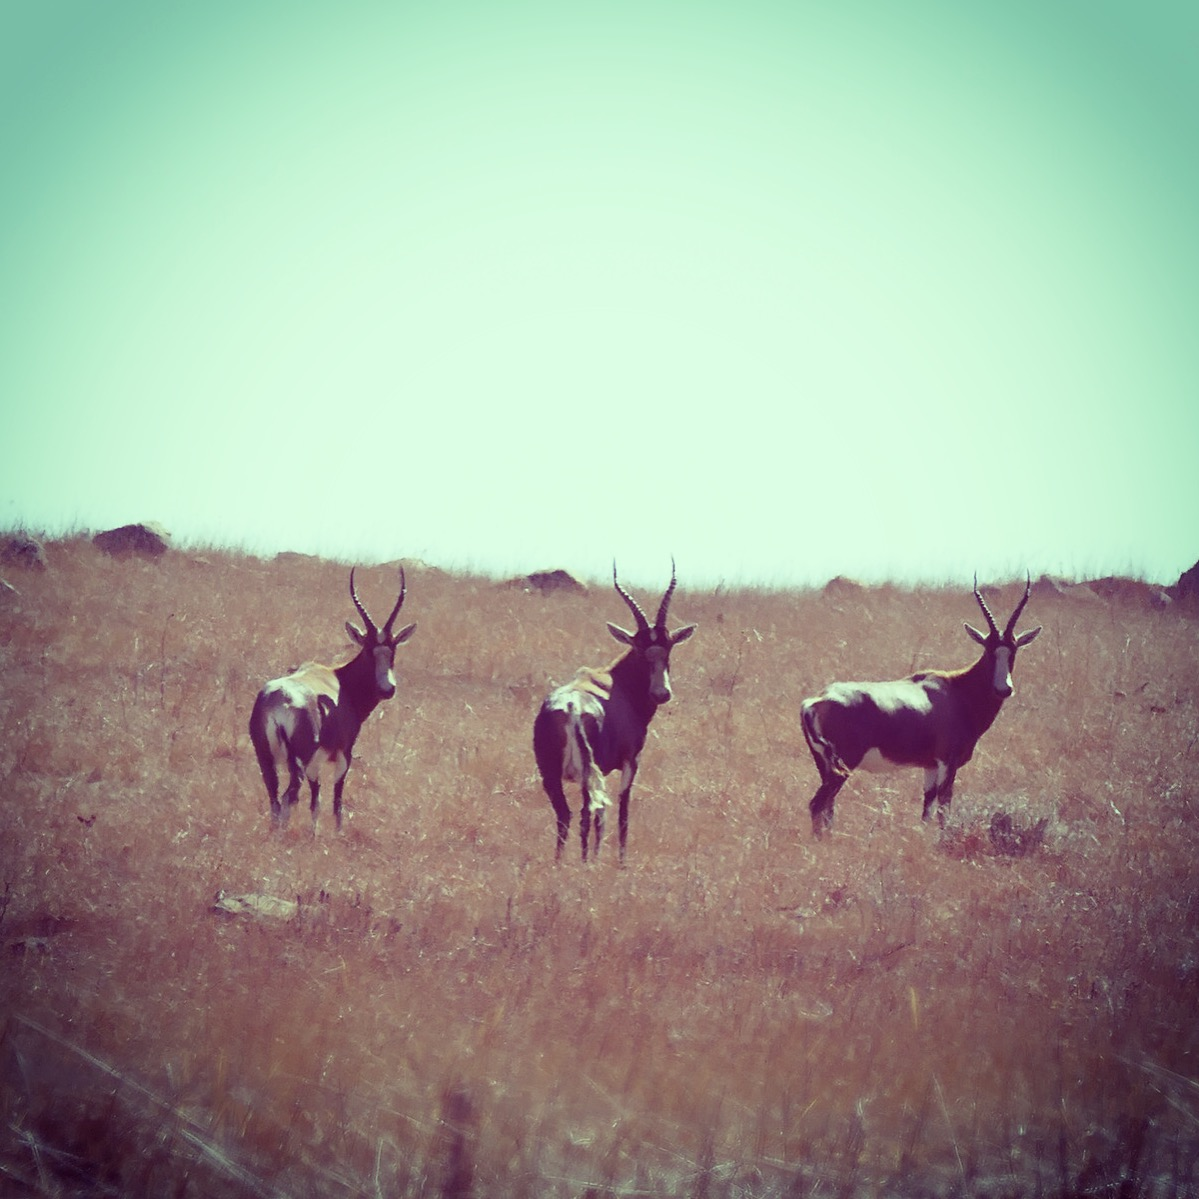 Noah's view of three blesbok. Noah Strycker